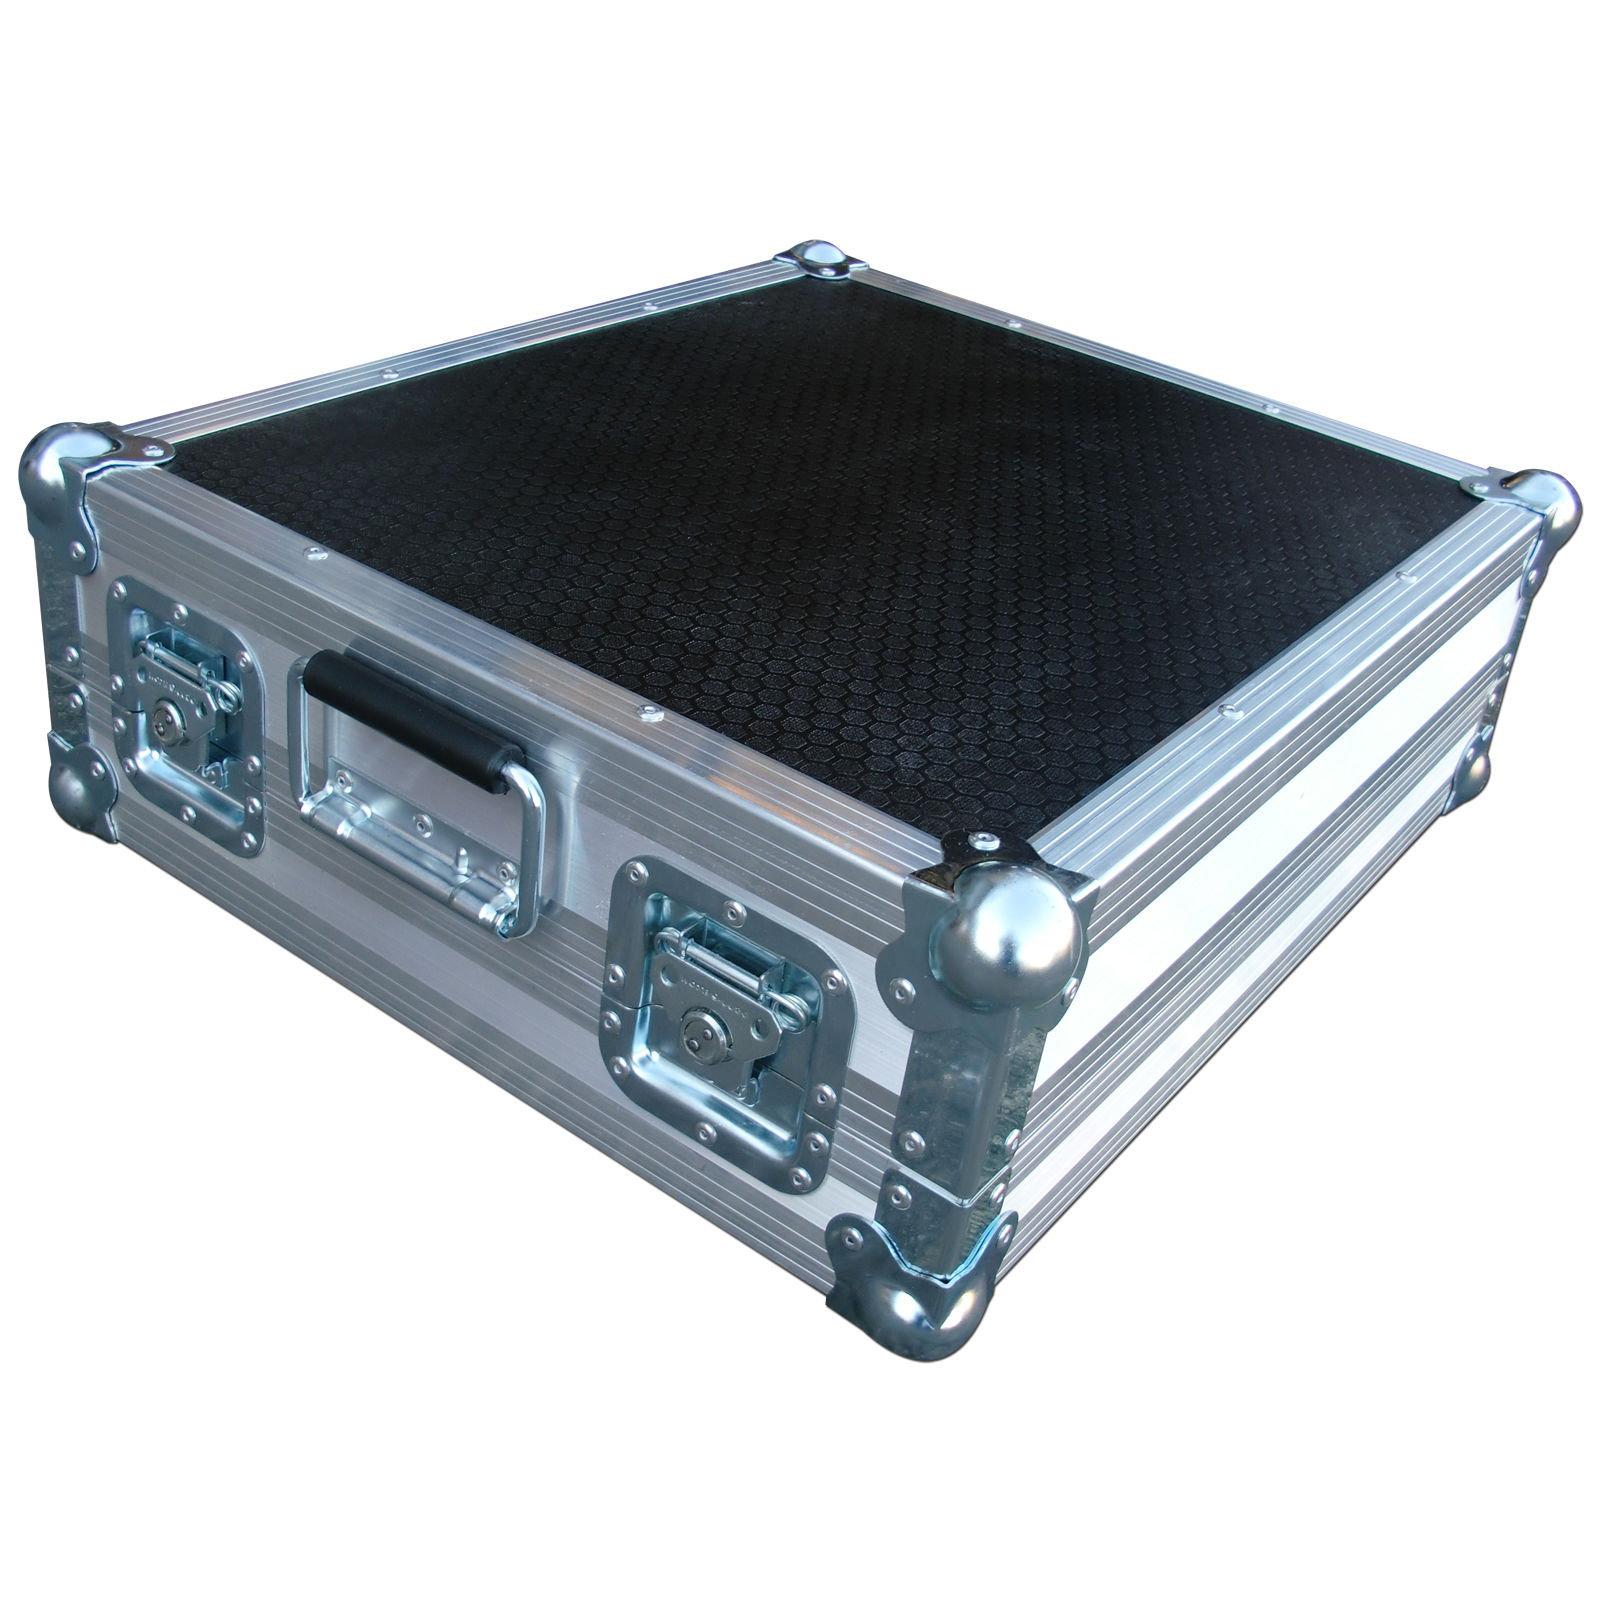 mackie 1202 vlz pro mixer flight case. Black Bedroom Furniture Sets. Home Design Ideas